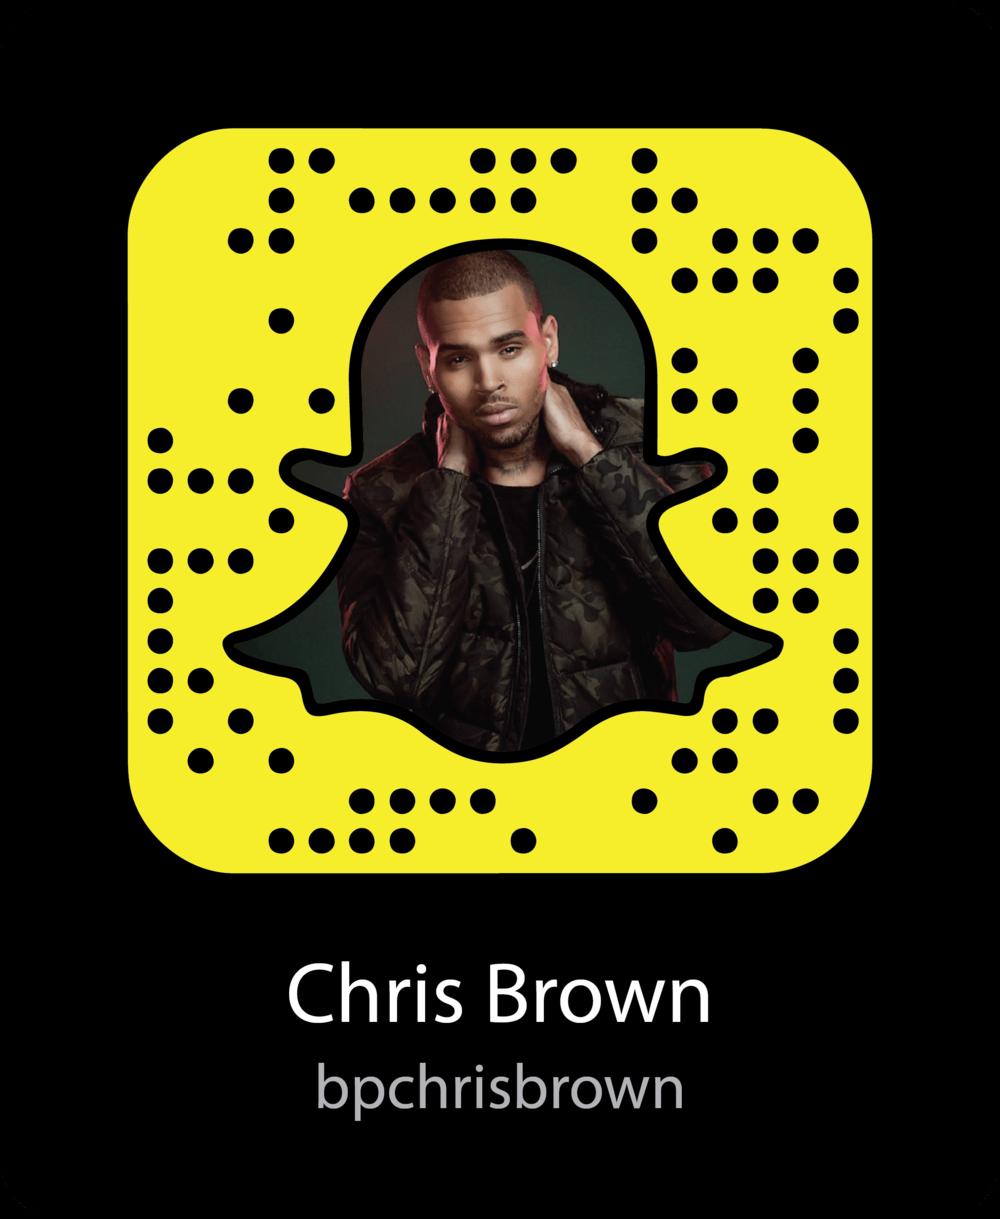 Chris Brown - Celebrity Lyrics